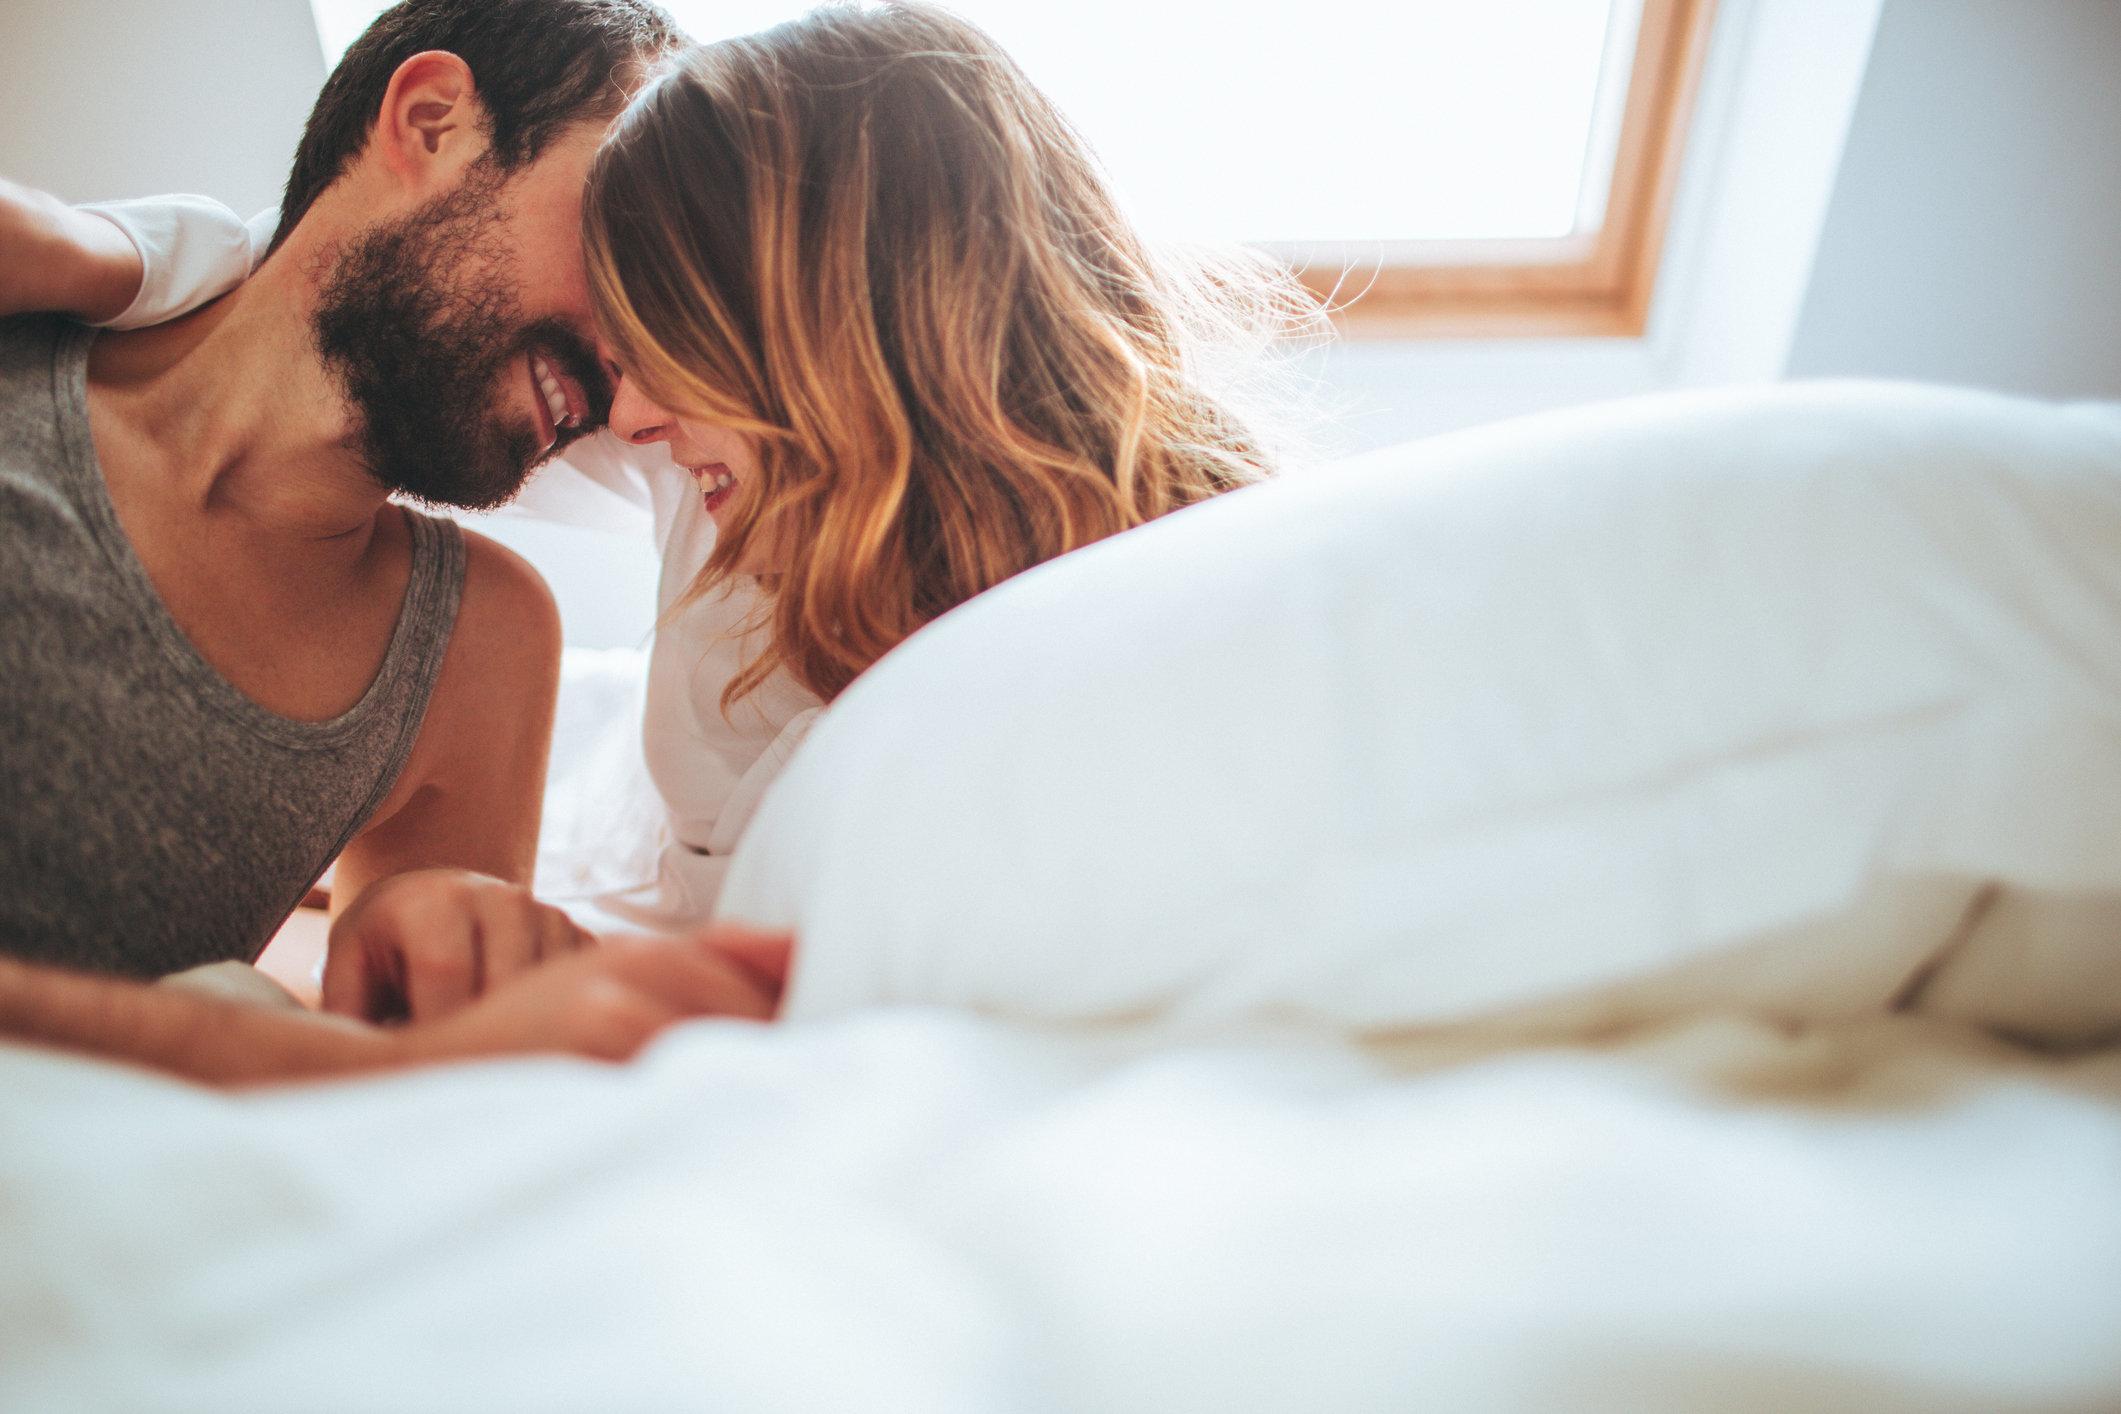 Most Dangerous Sex Position For Penis Fractures